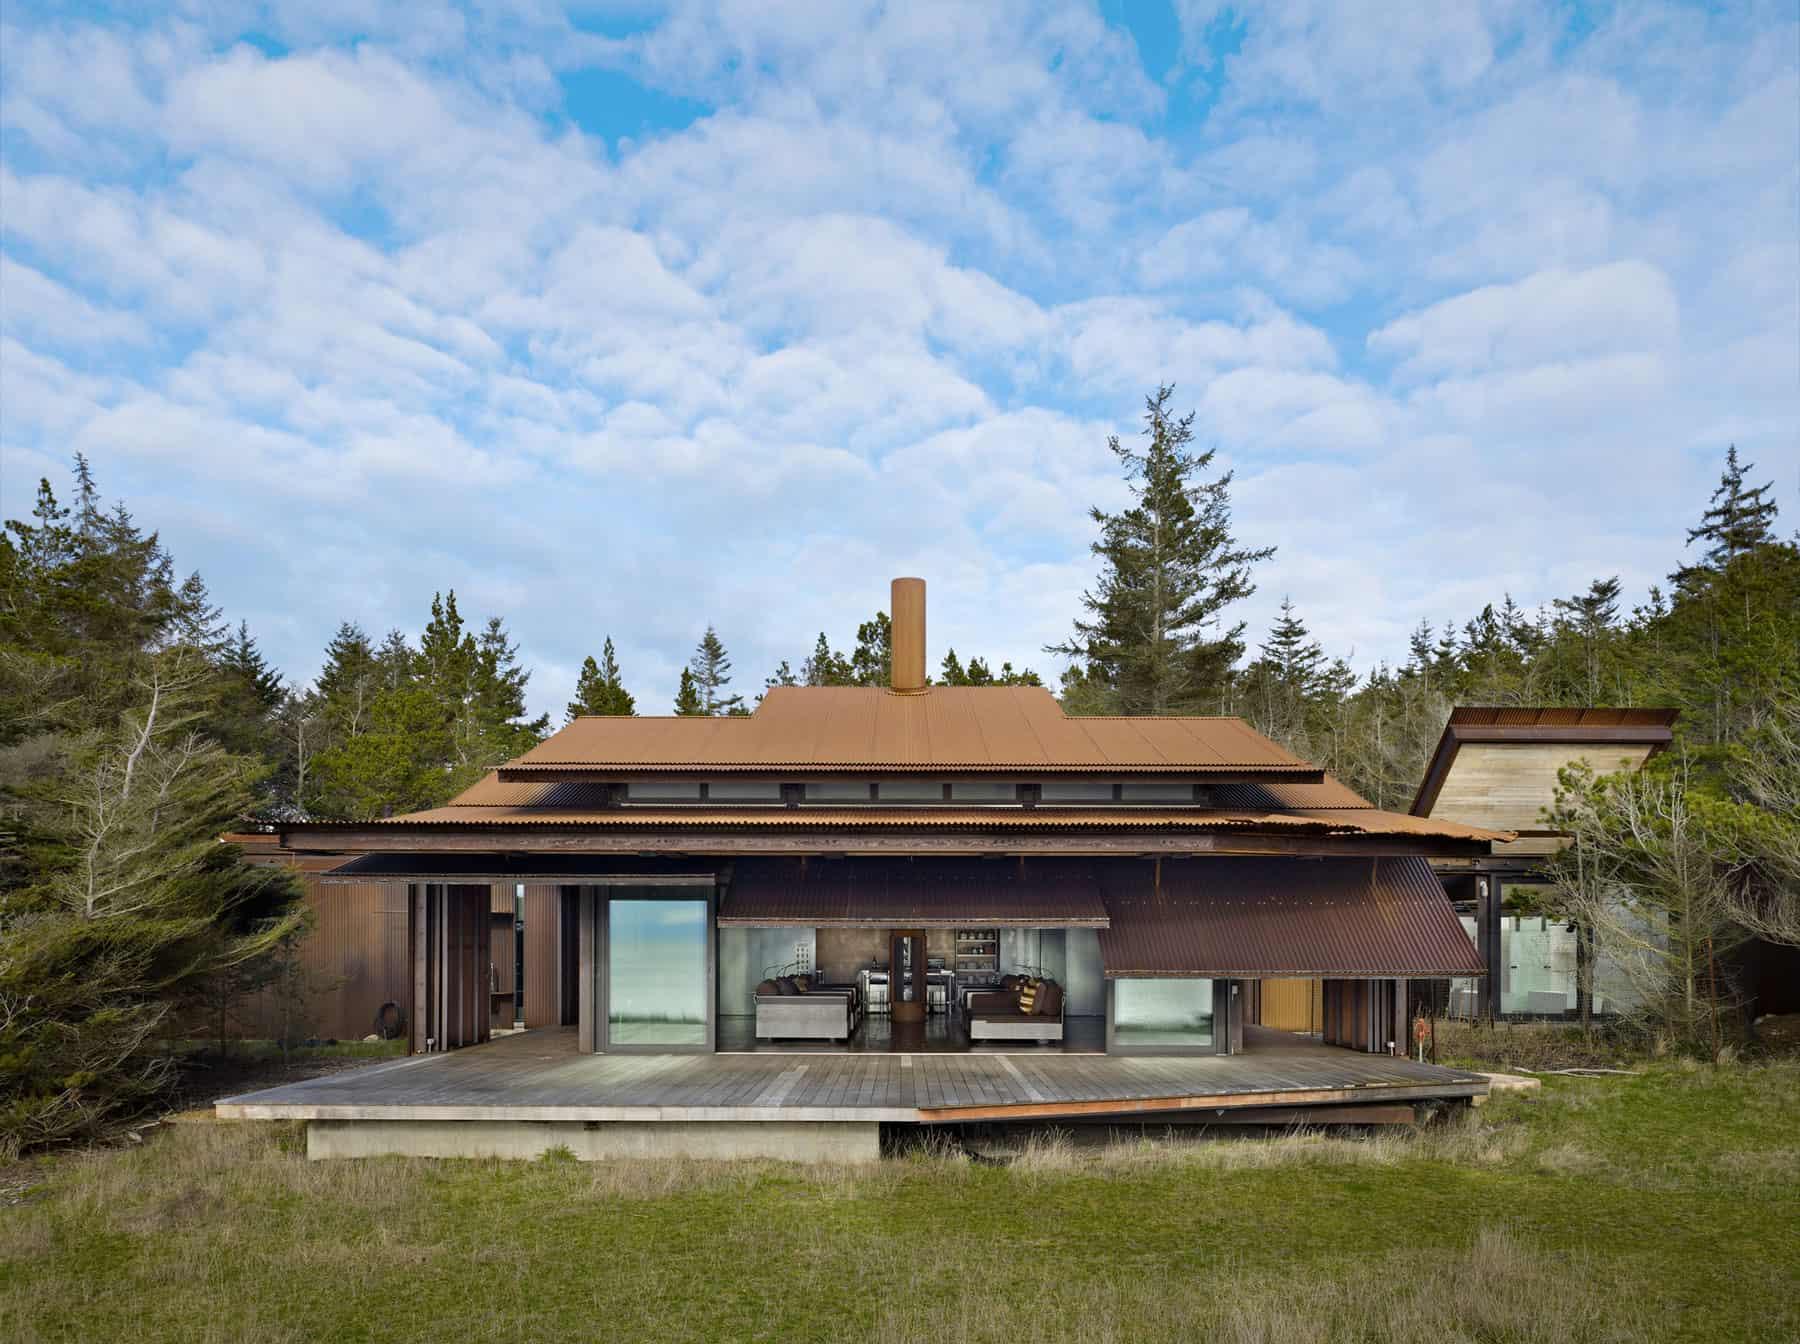 Shadowboxx by Olson Kundig Architects